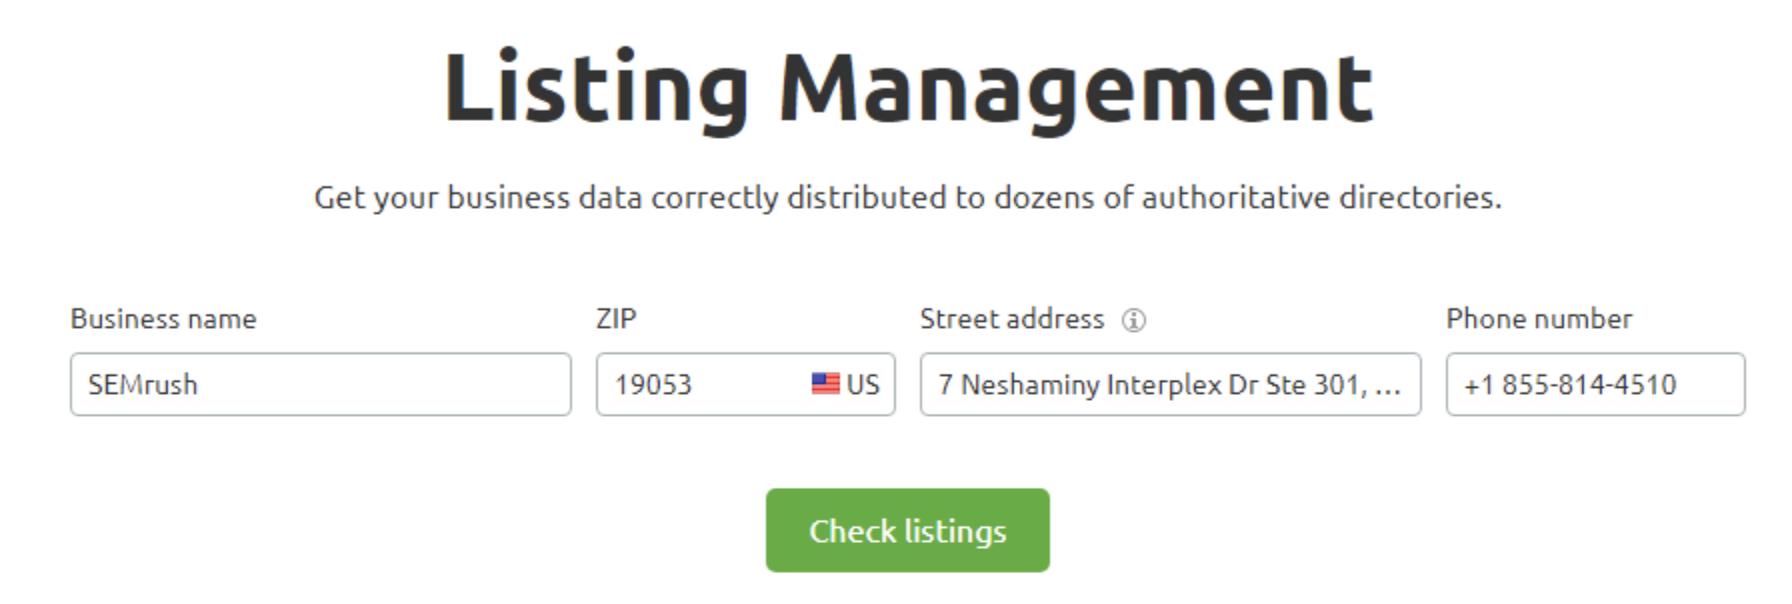 Listing Managment SEMrush